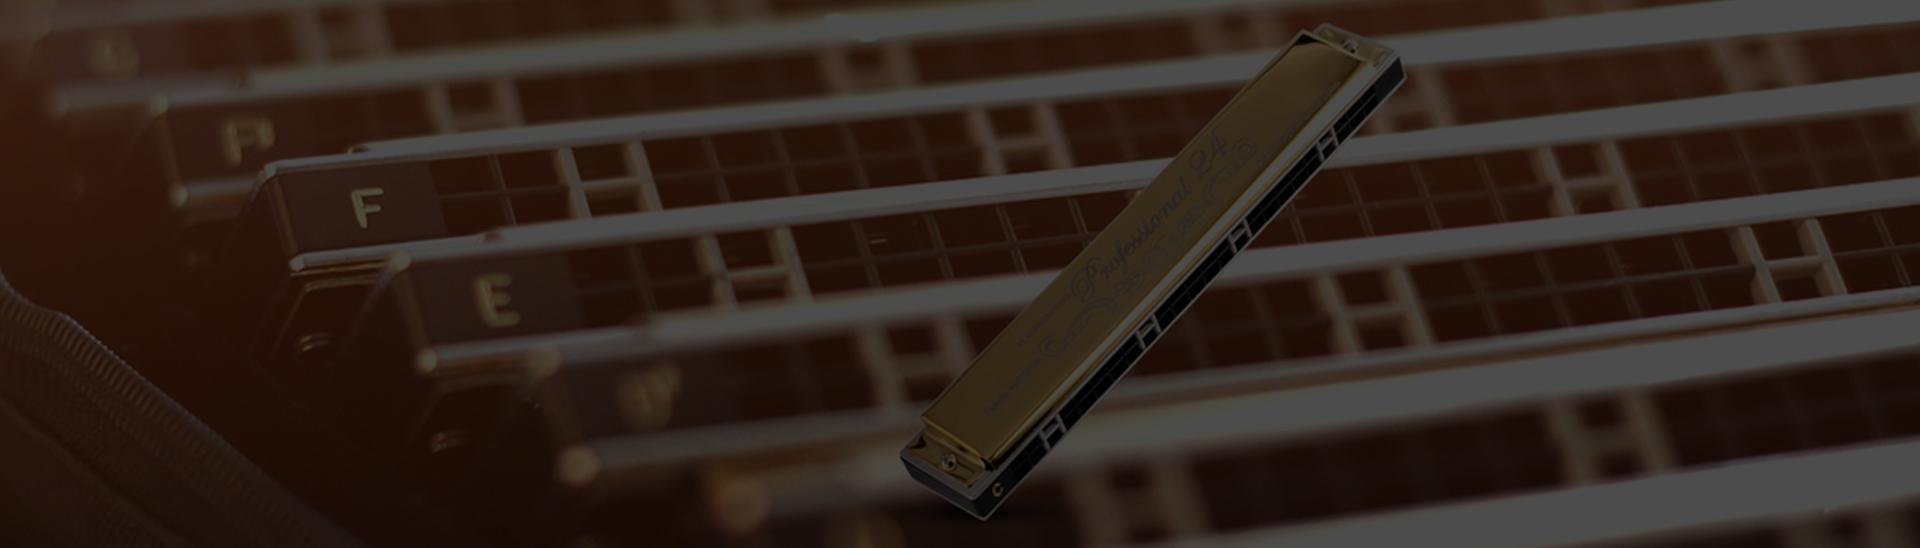 Kumbaya harmonica tab